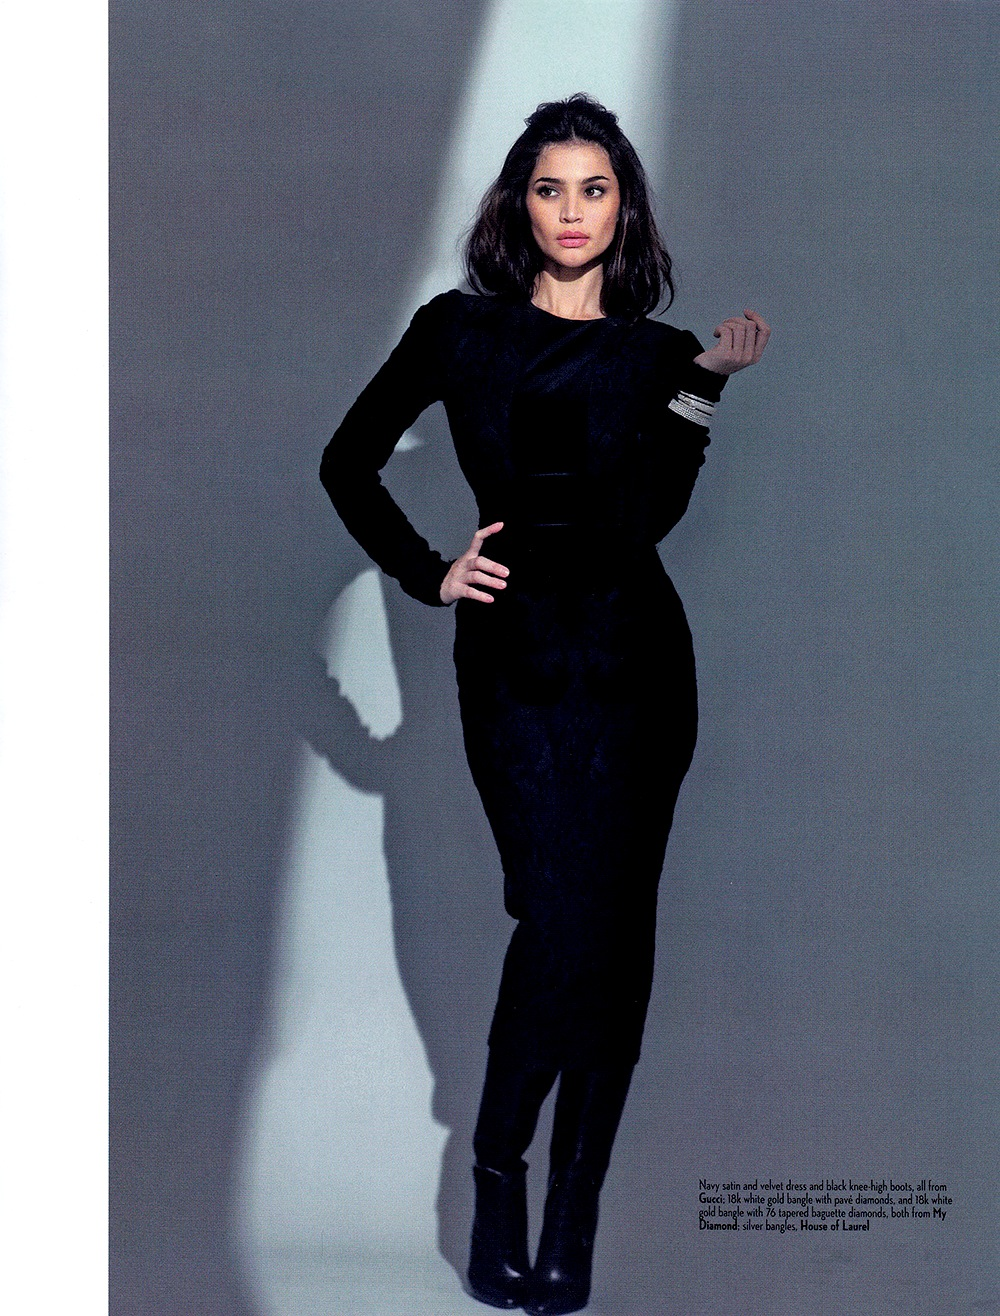 Anne curtis fashion style 19